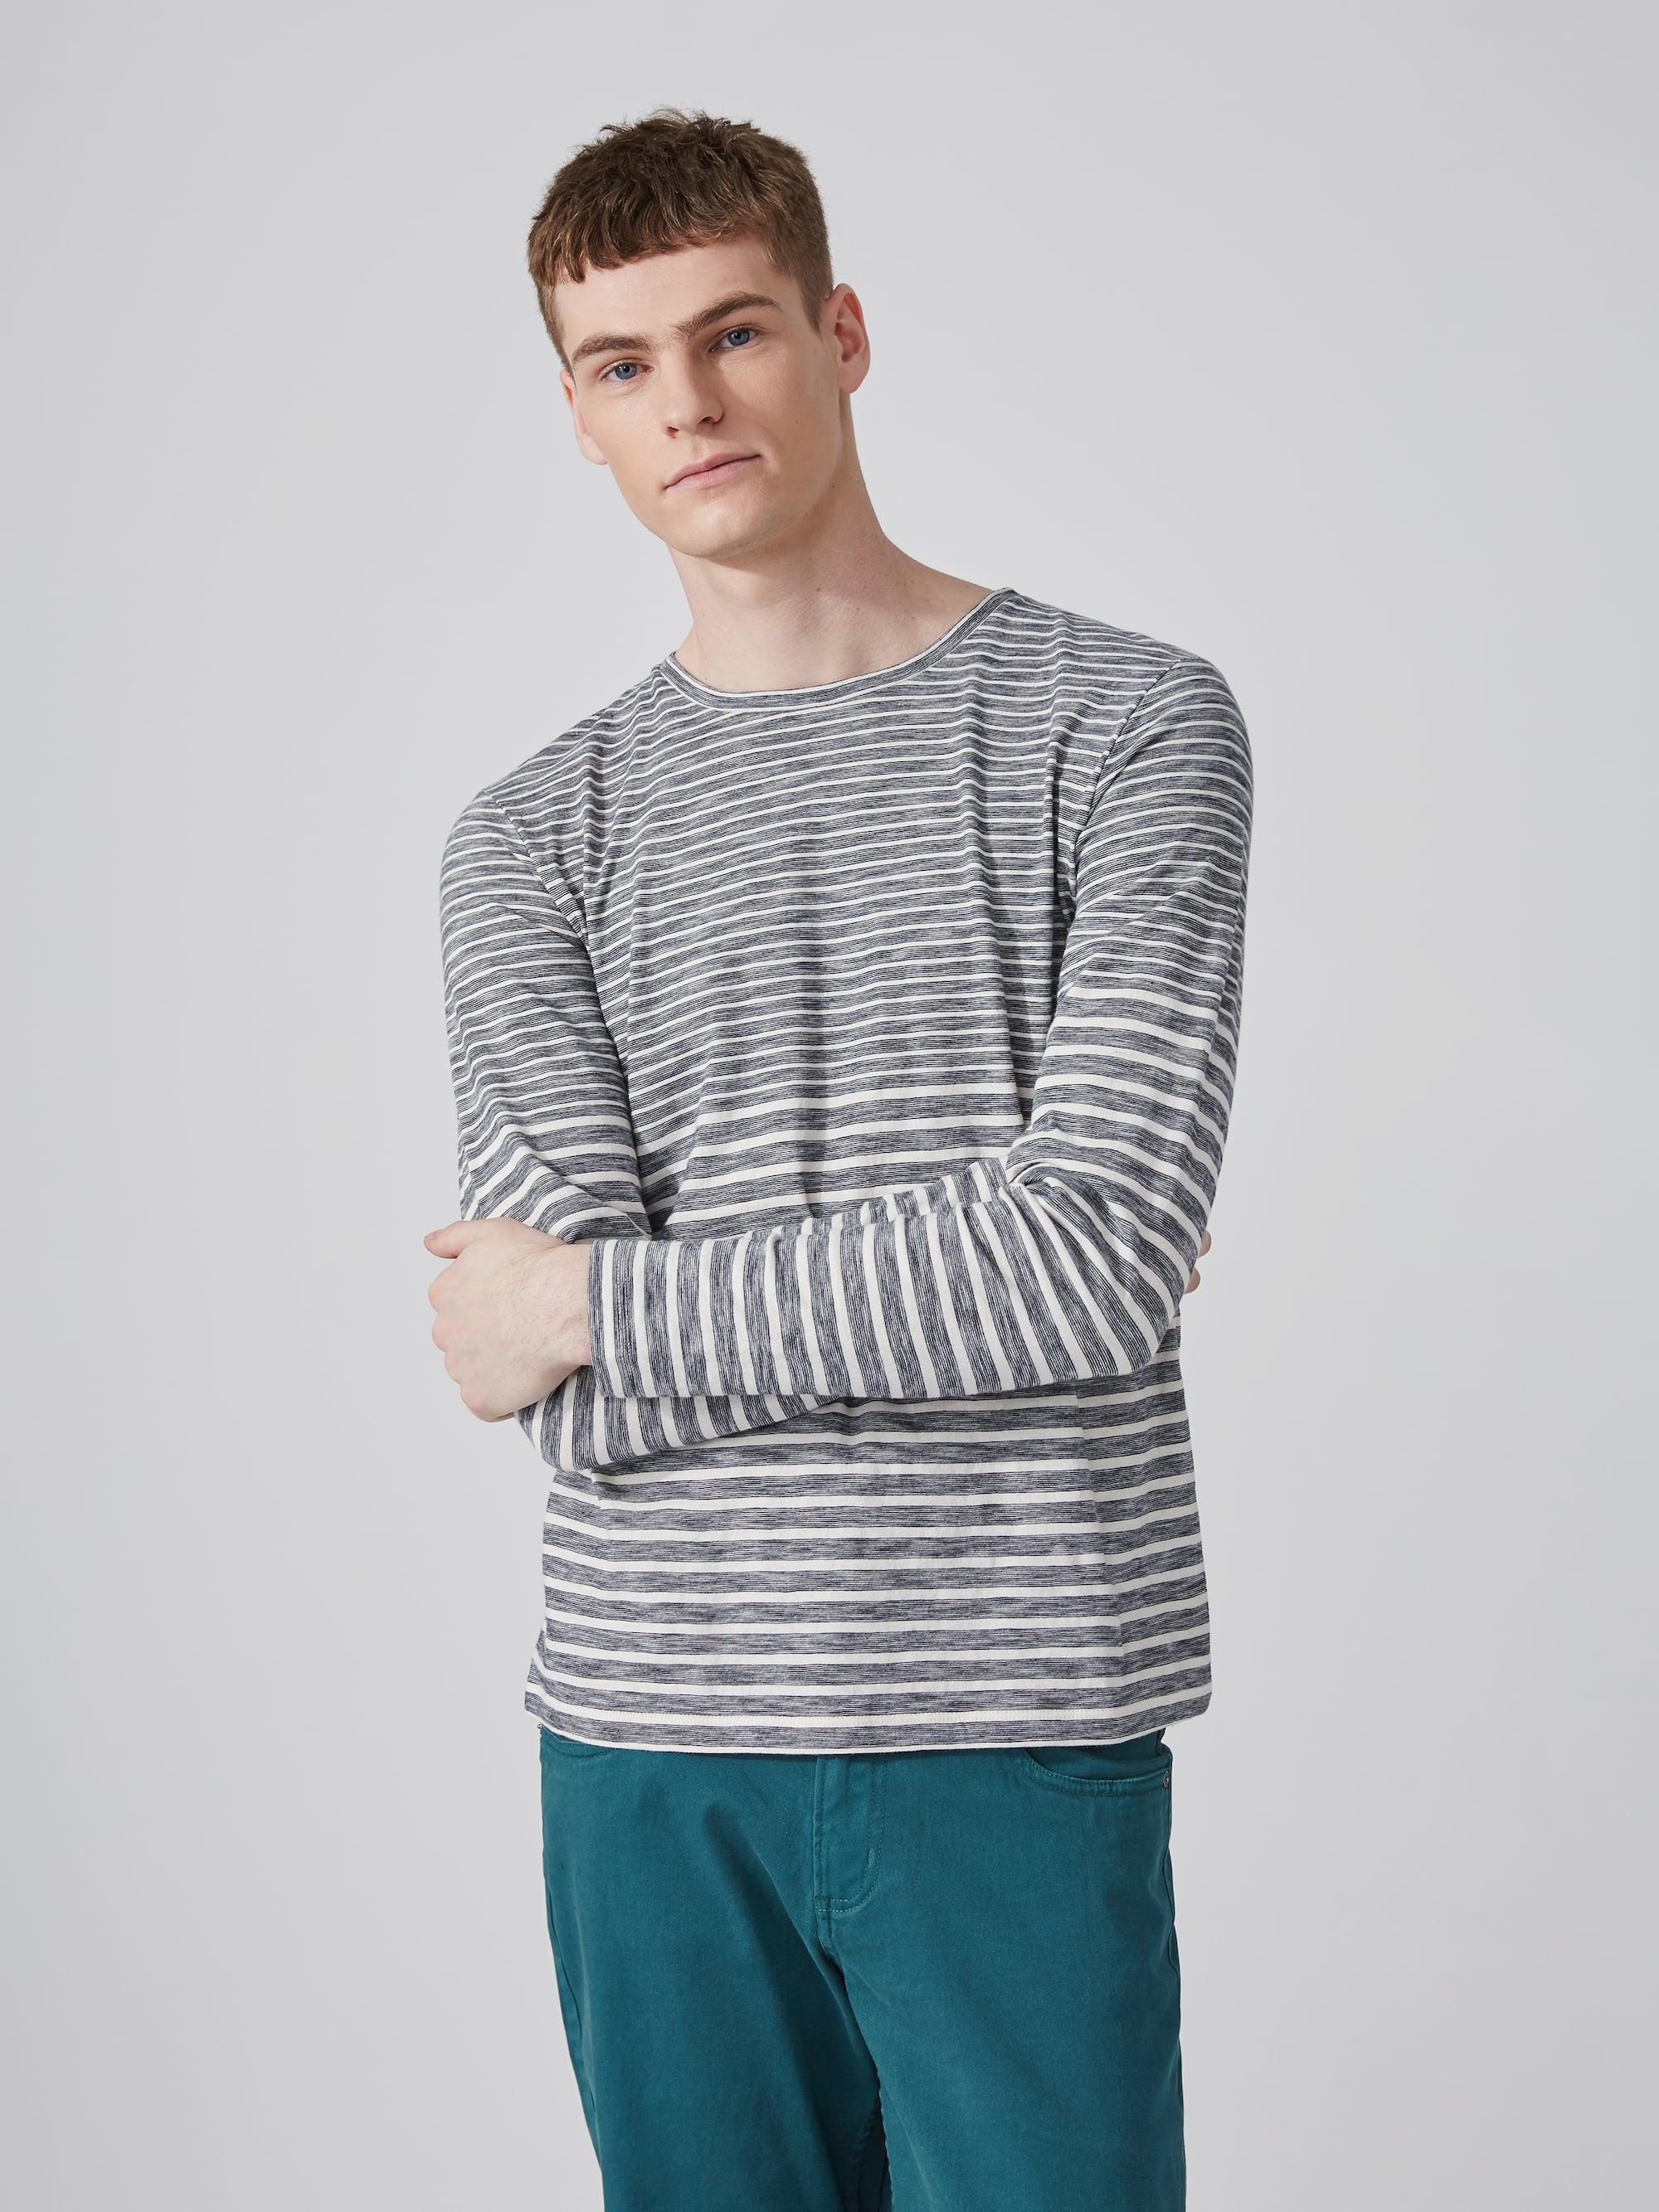 Frank oak multi stripe cotton crewneck t shirt in navy for Frank and oak shirt